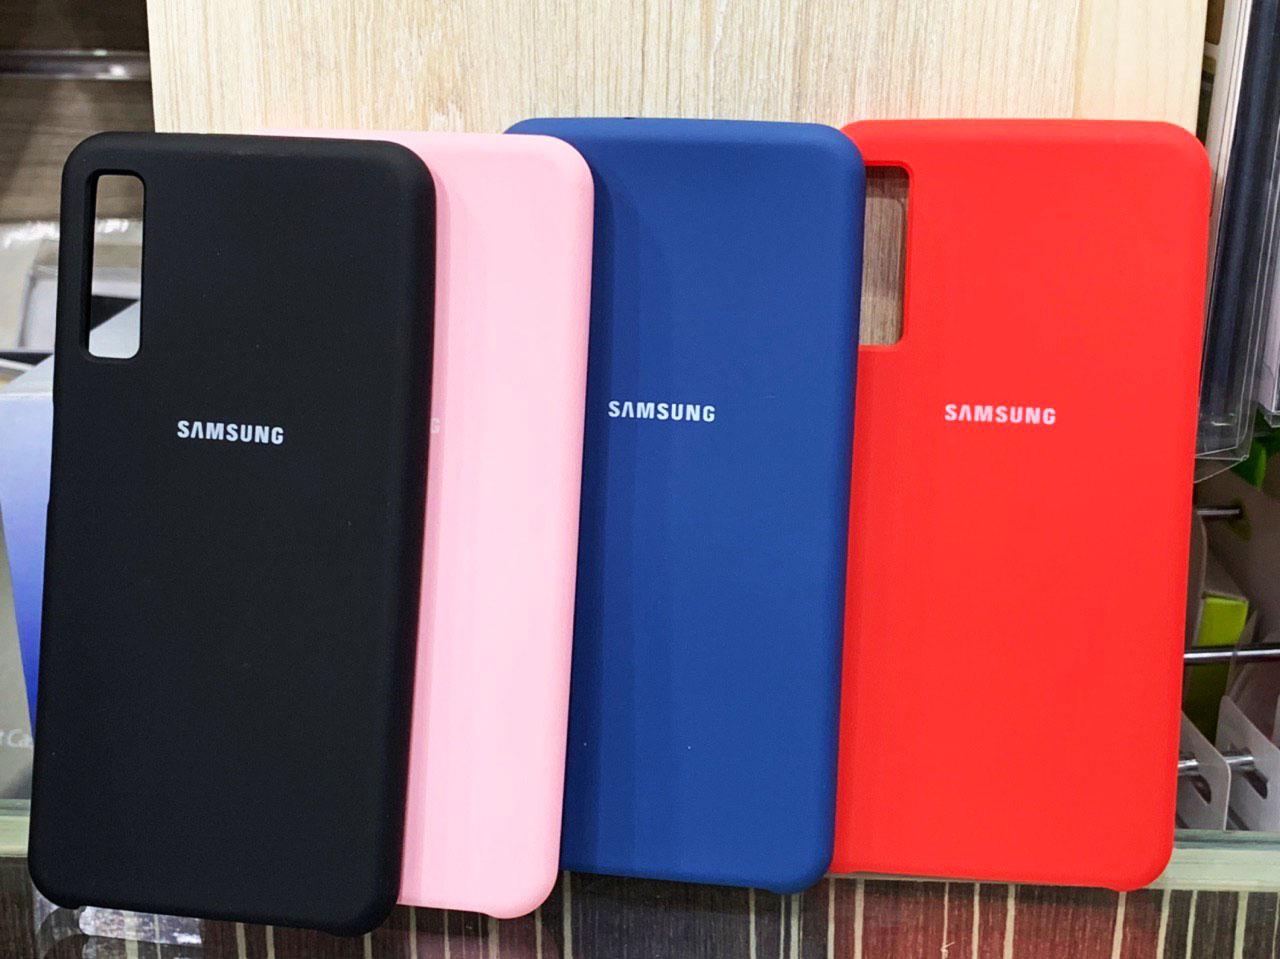 قاب محافظ سیلیکونی سامسونگ Samsung Galaxy A7 2018 (A750)